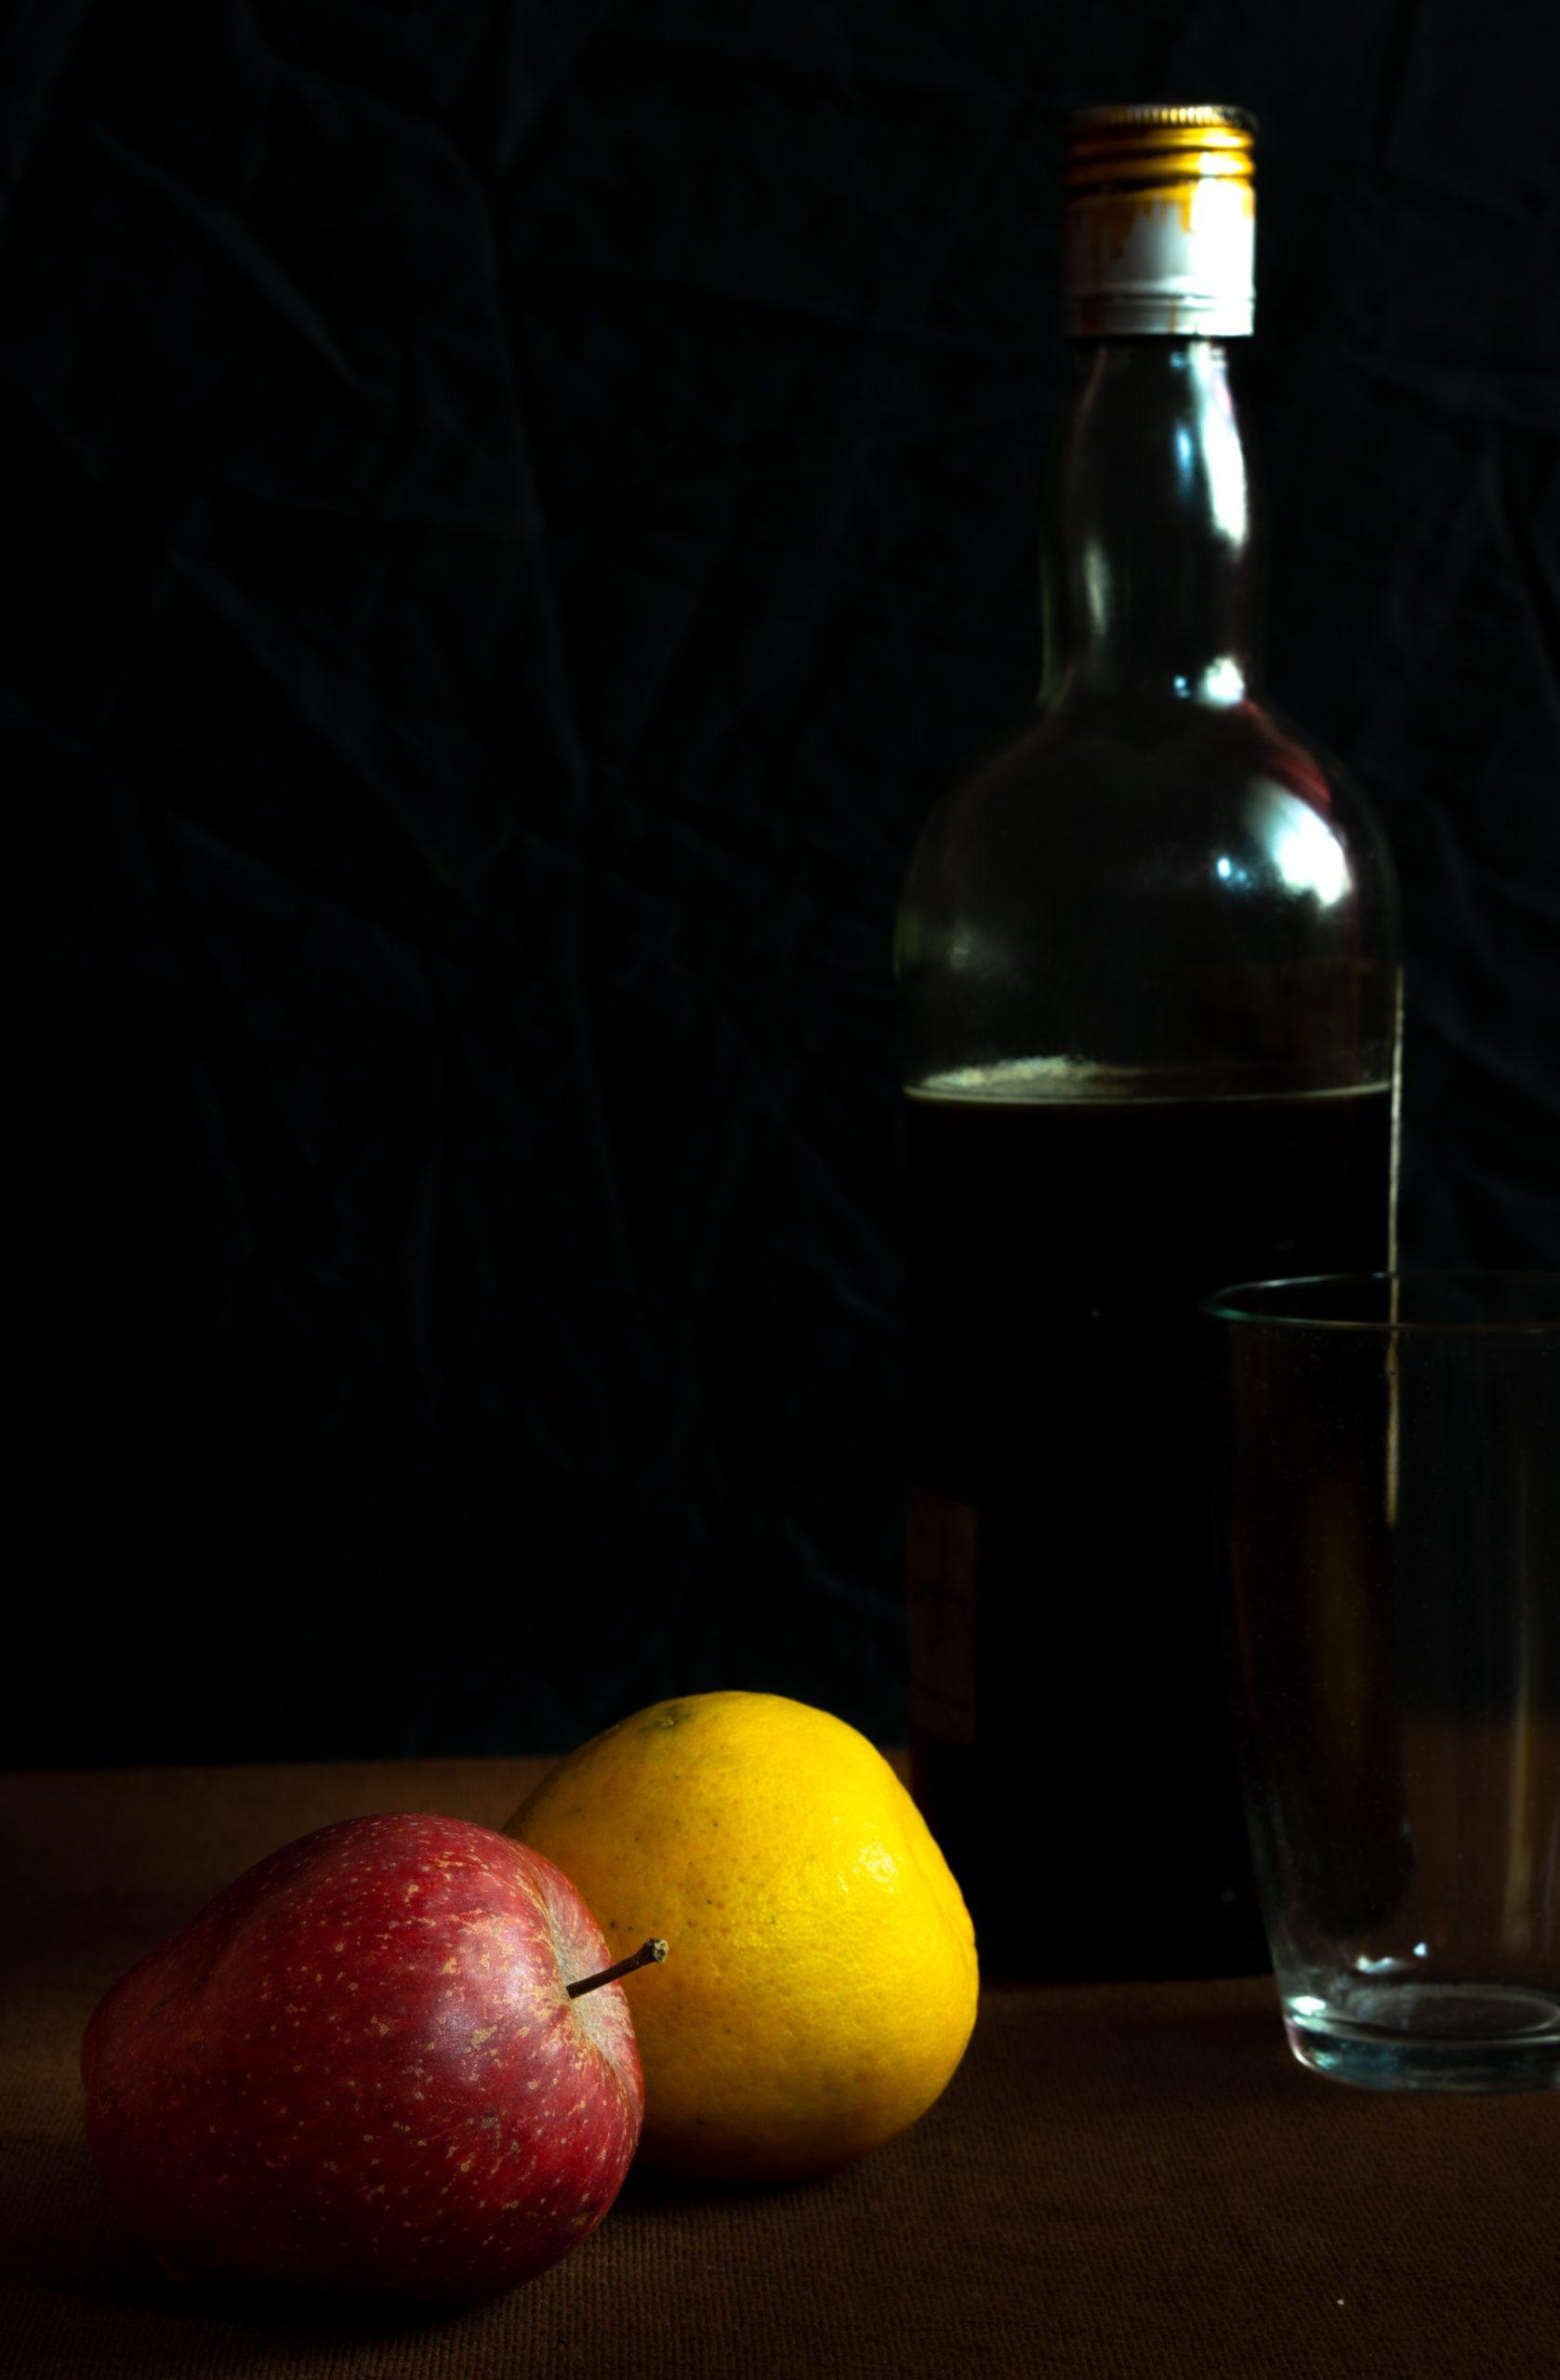 Fresh fruit and glass bottle